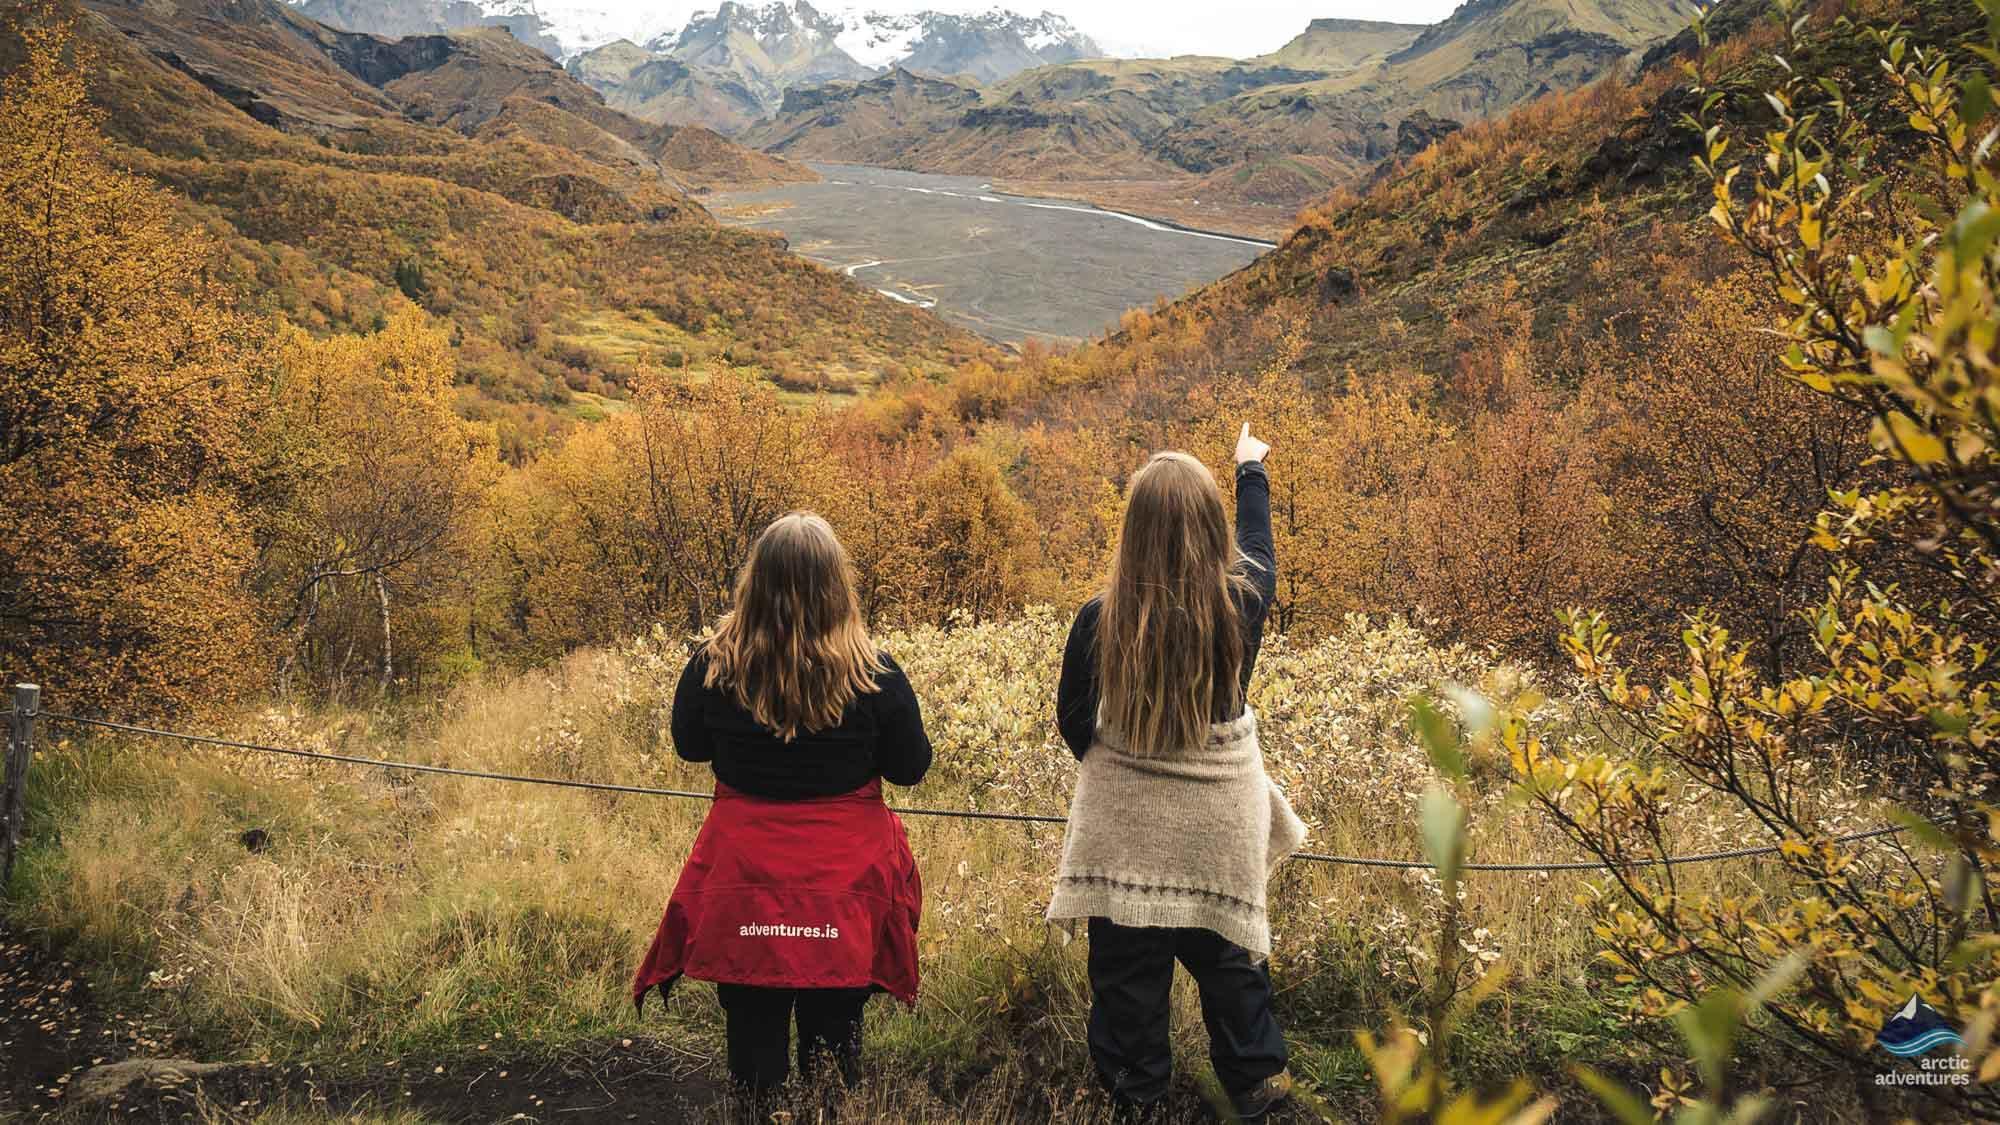 Trekking Tours in Iceland